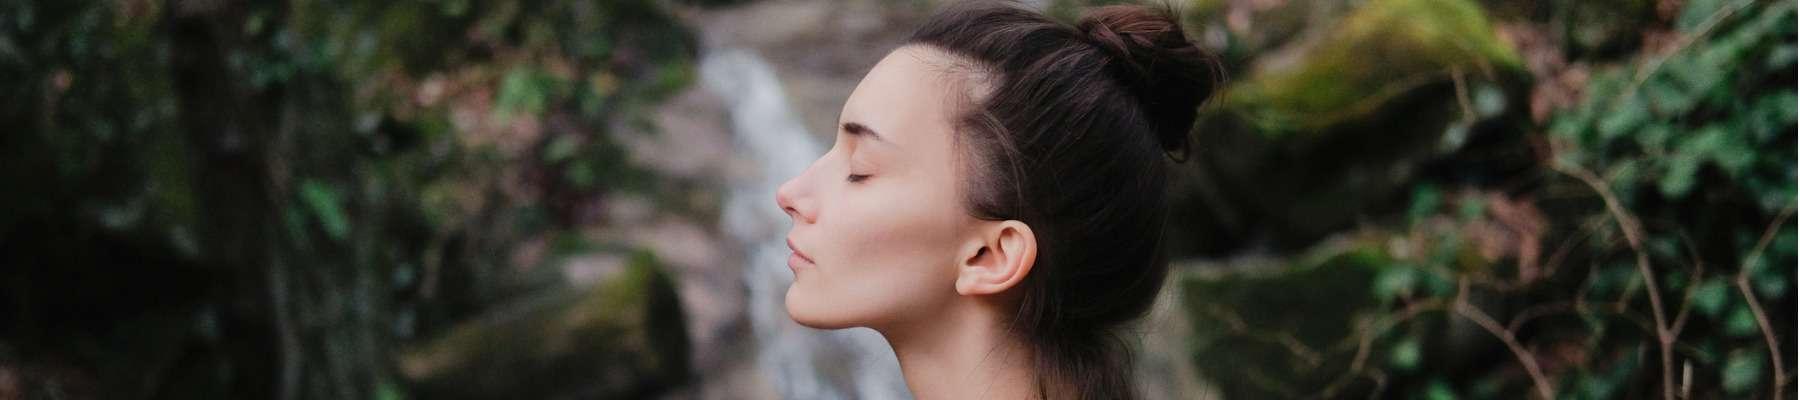 Mindfulness & Addiction